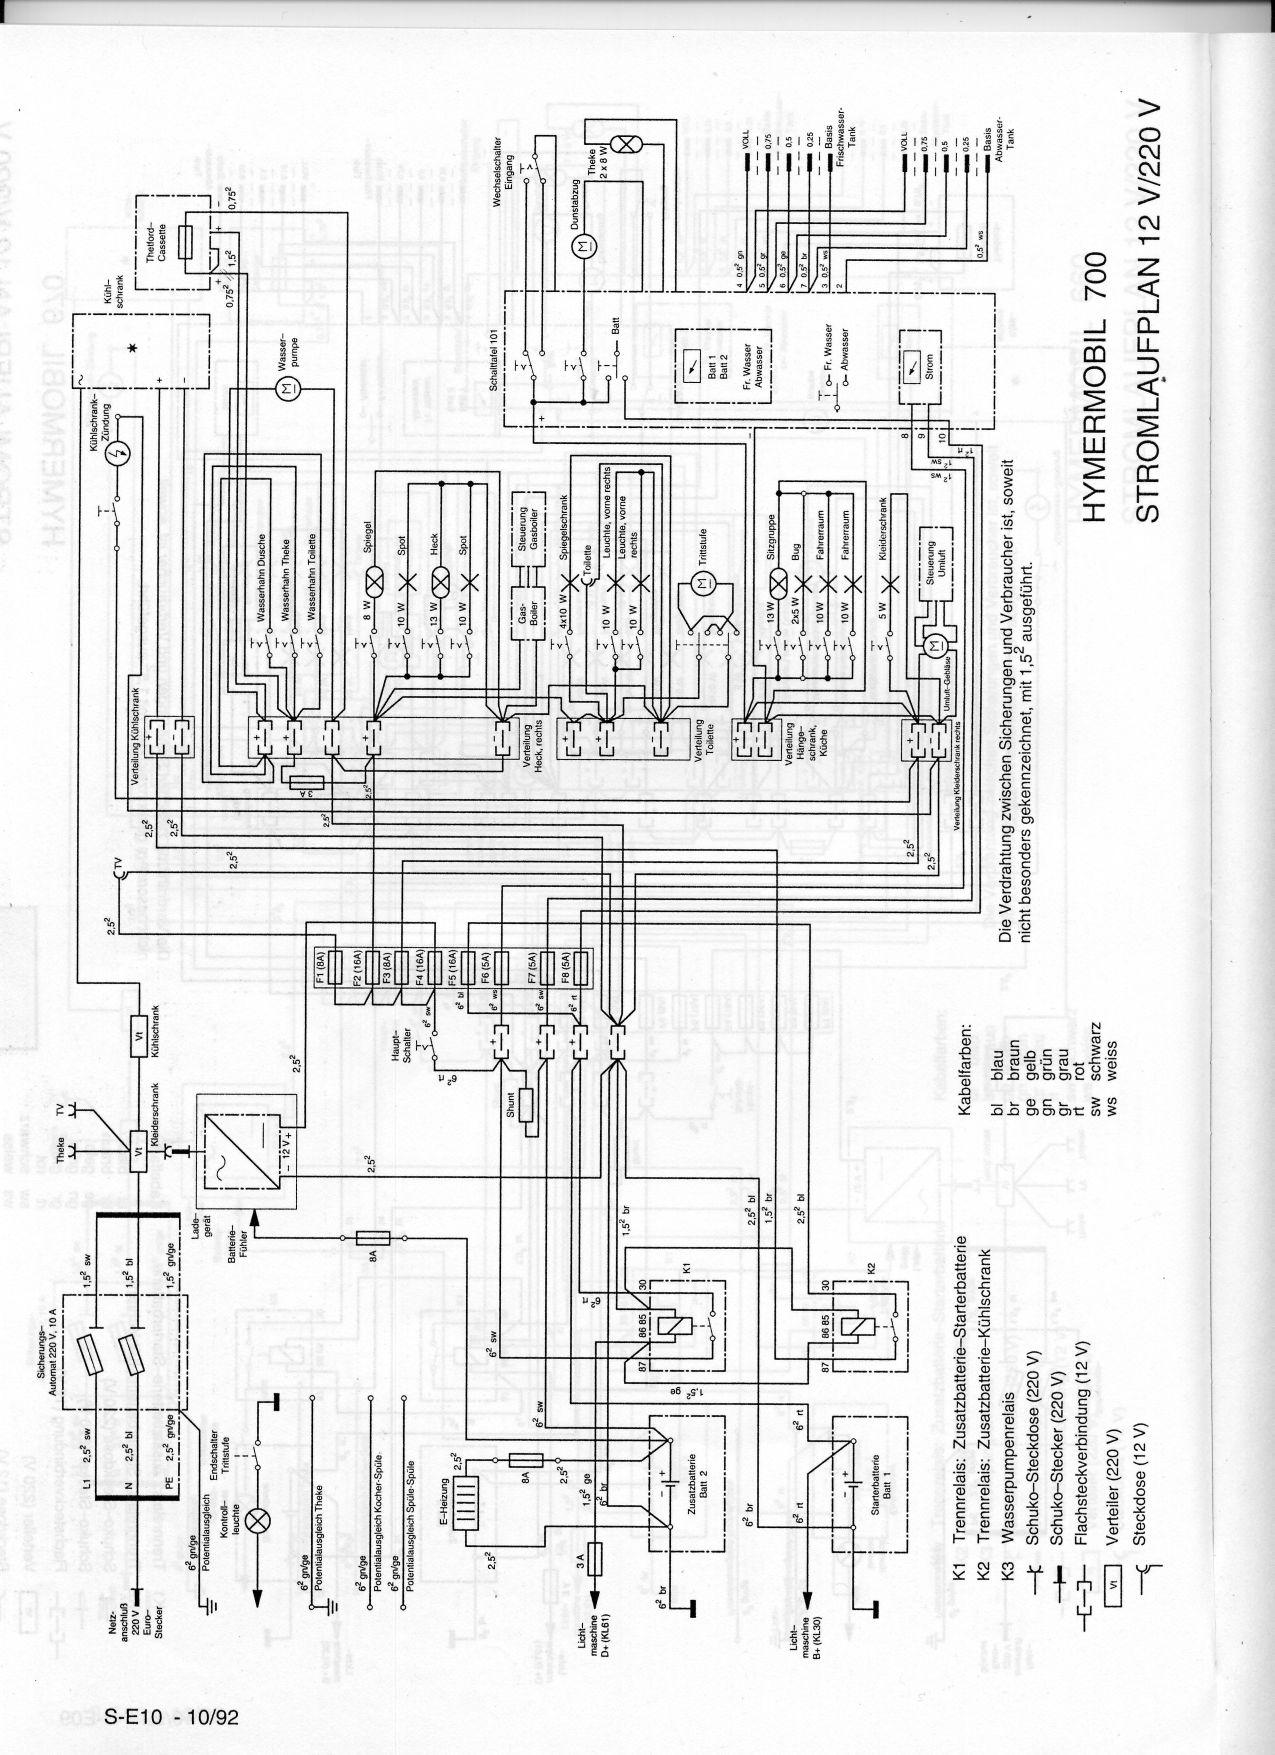 Stromlaufplane